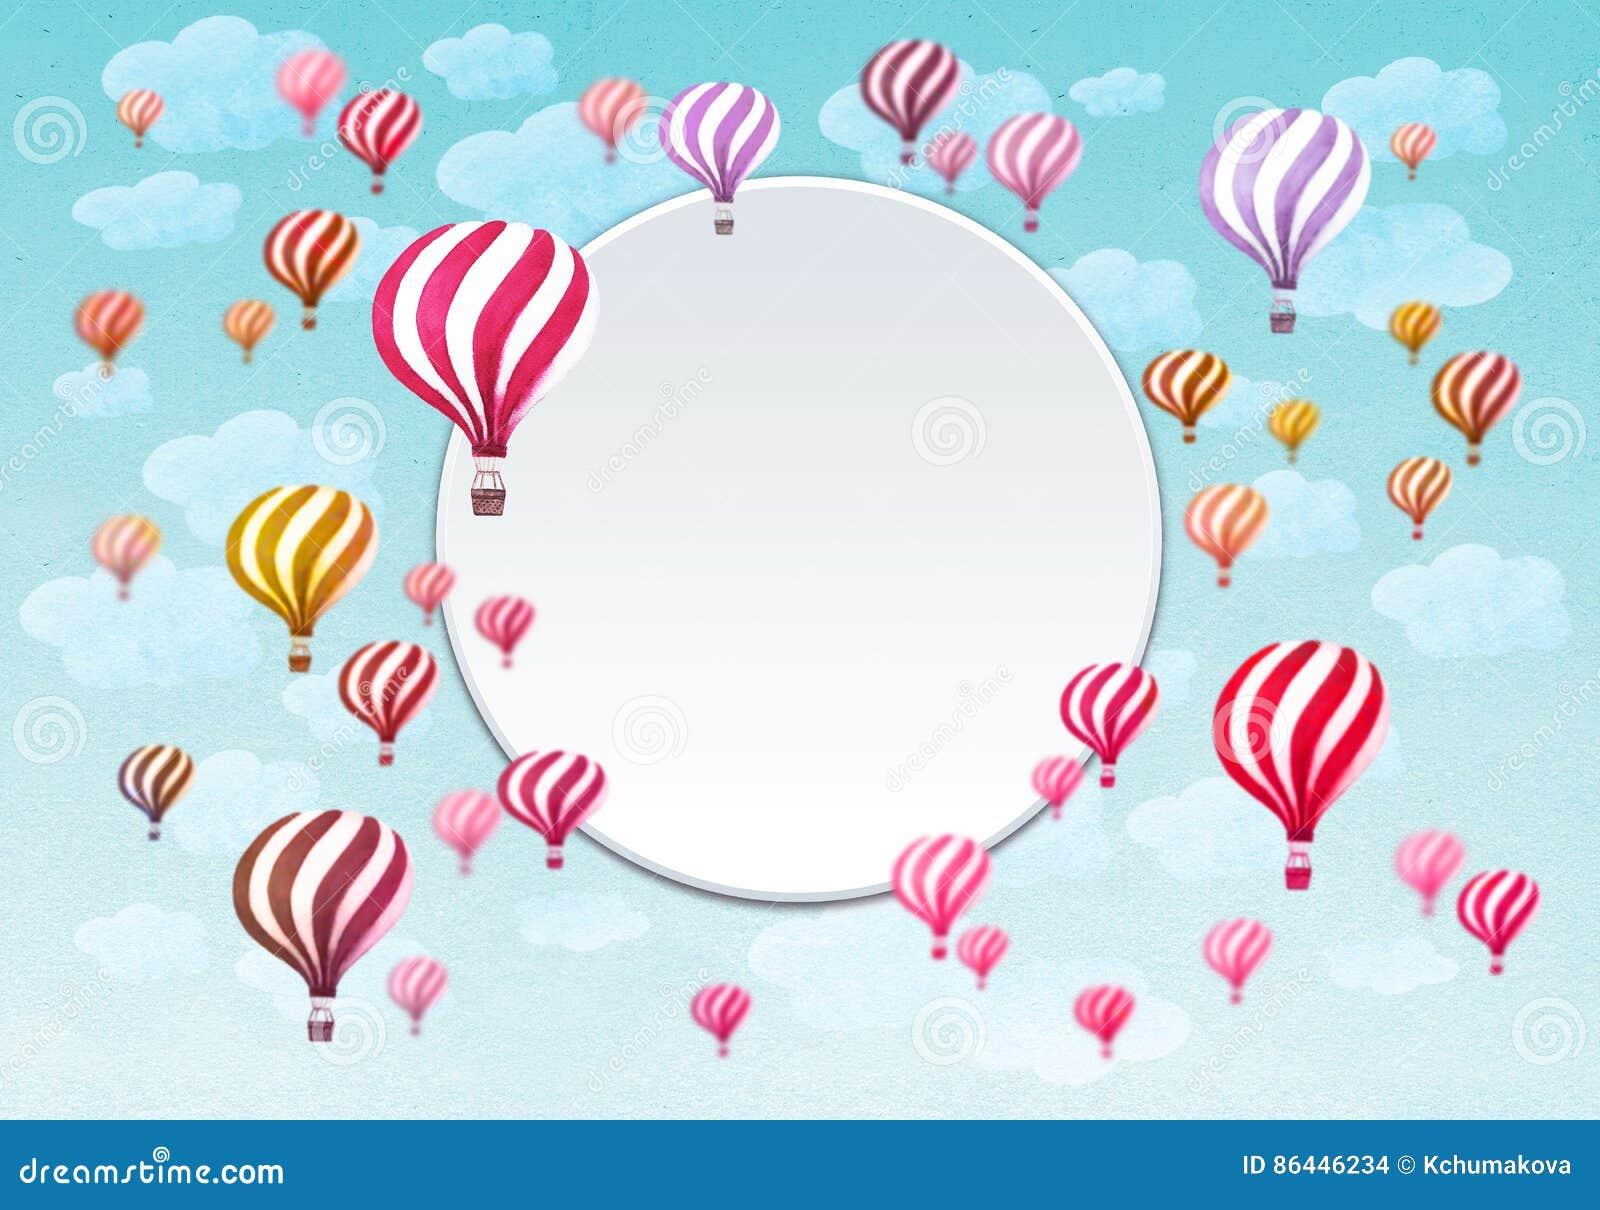 Frame Of Hot Air Balloons Stock Illustration Illustration Of